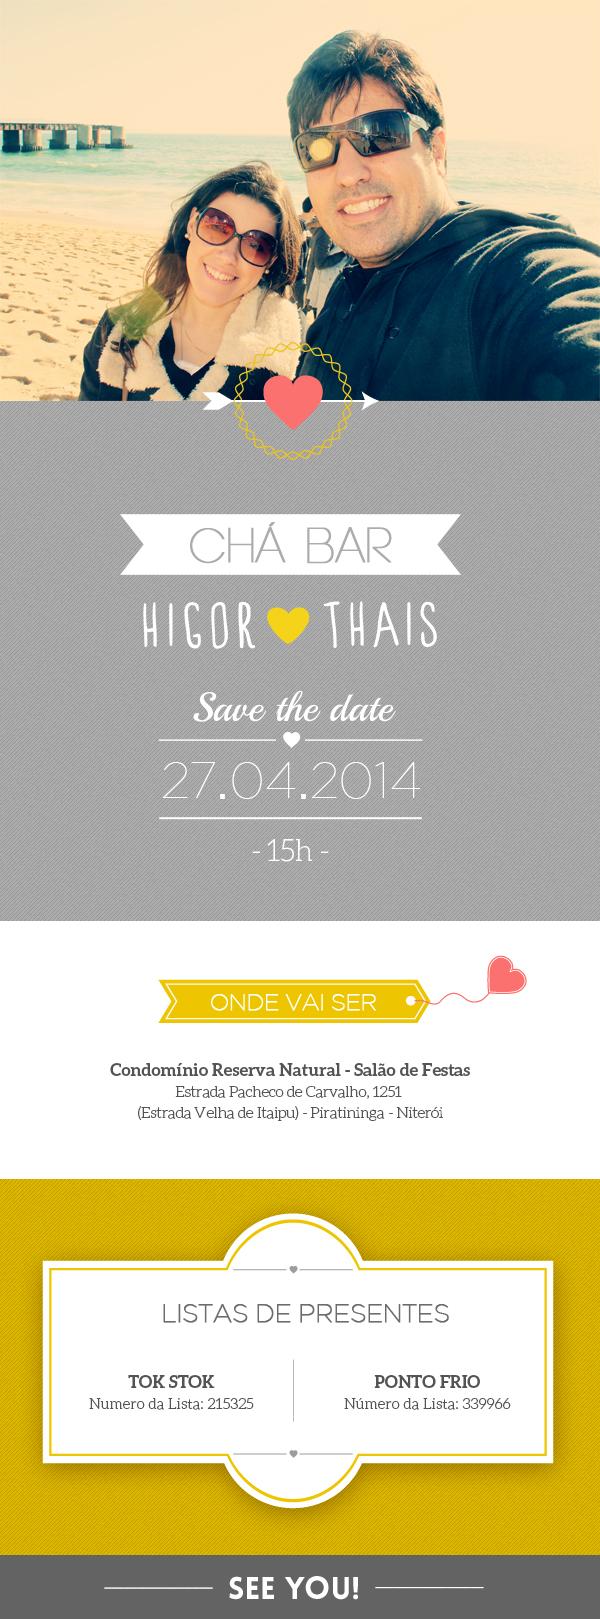 Convite_Chá_Bar